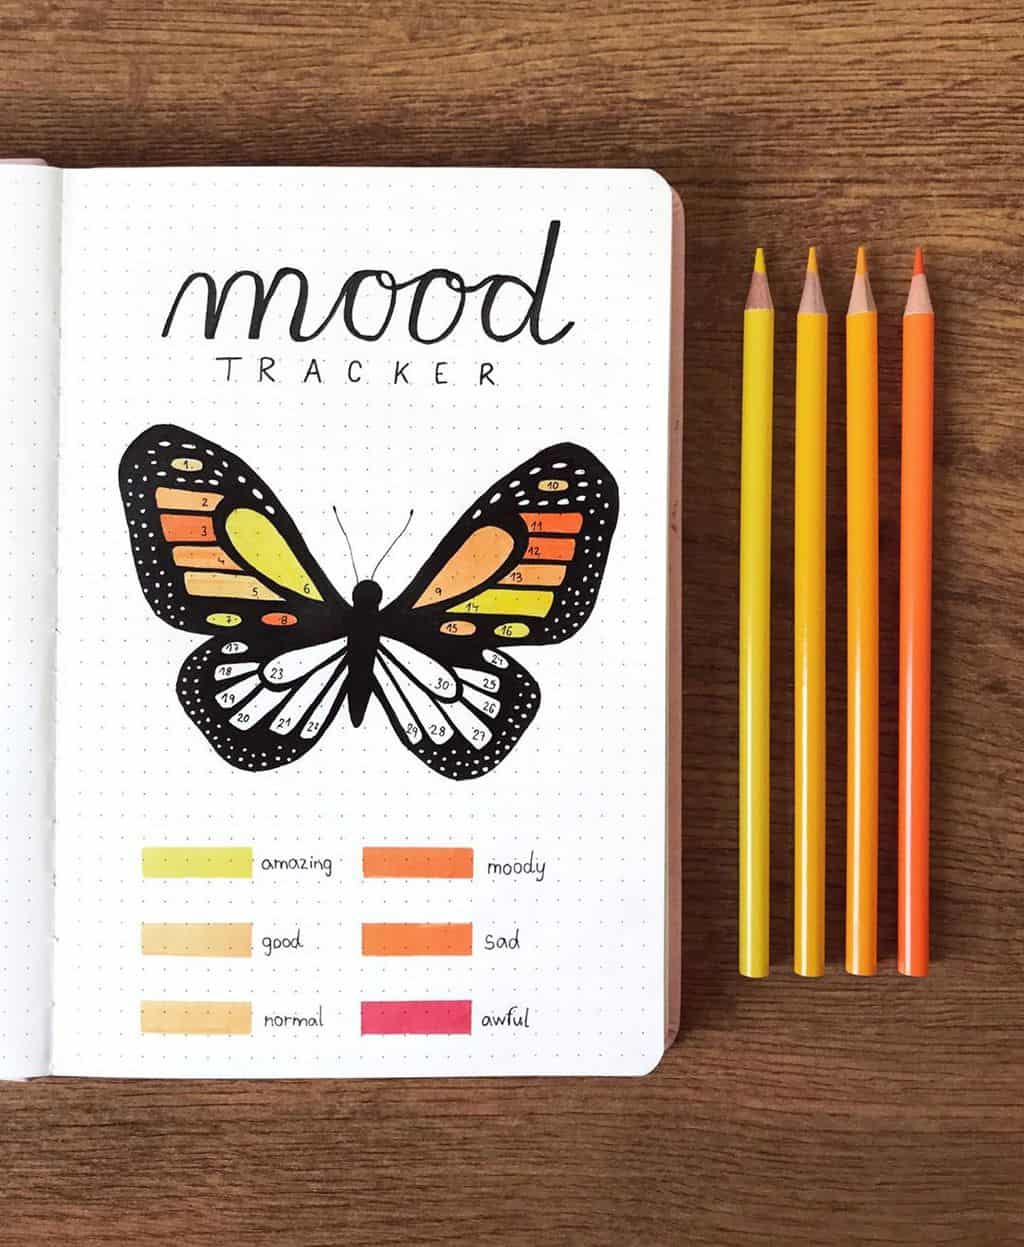 Mood Tracker by @journalbyronnie | Masha Plans